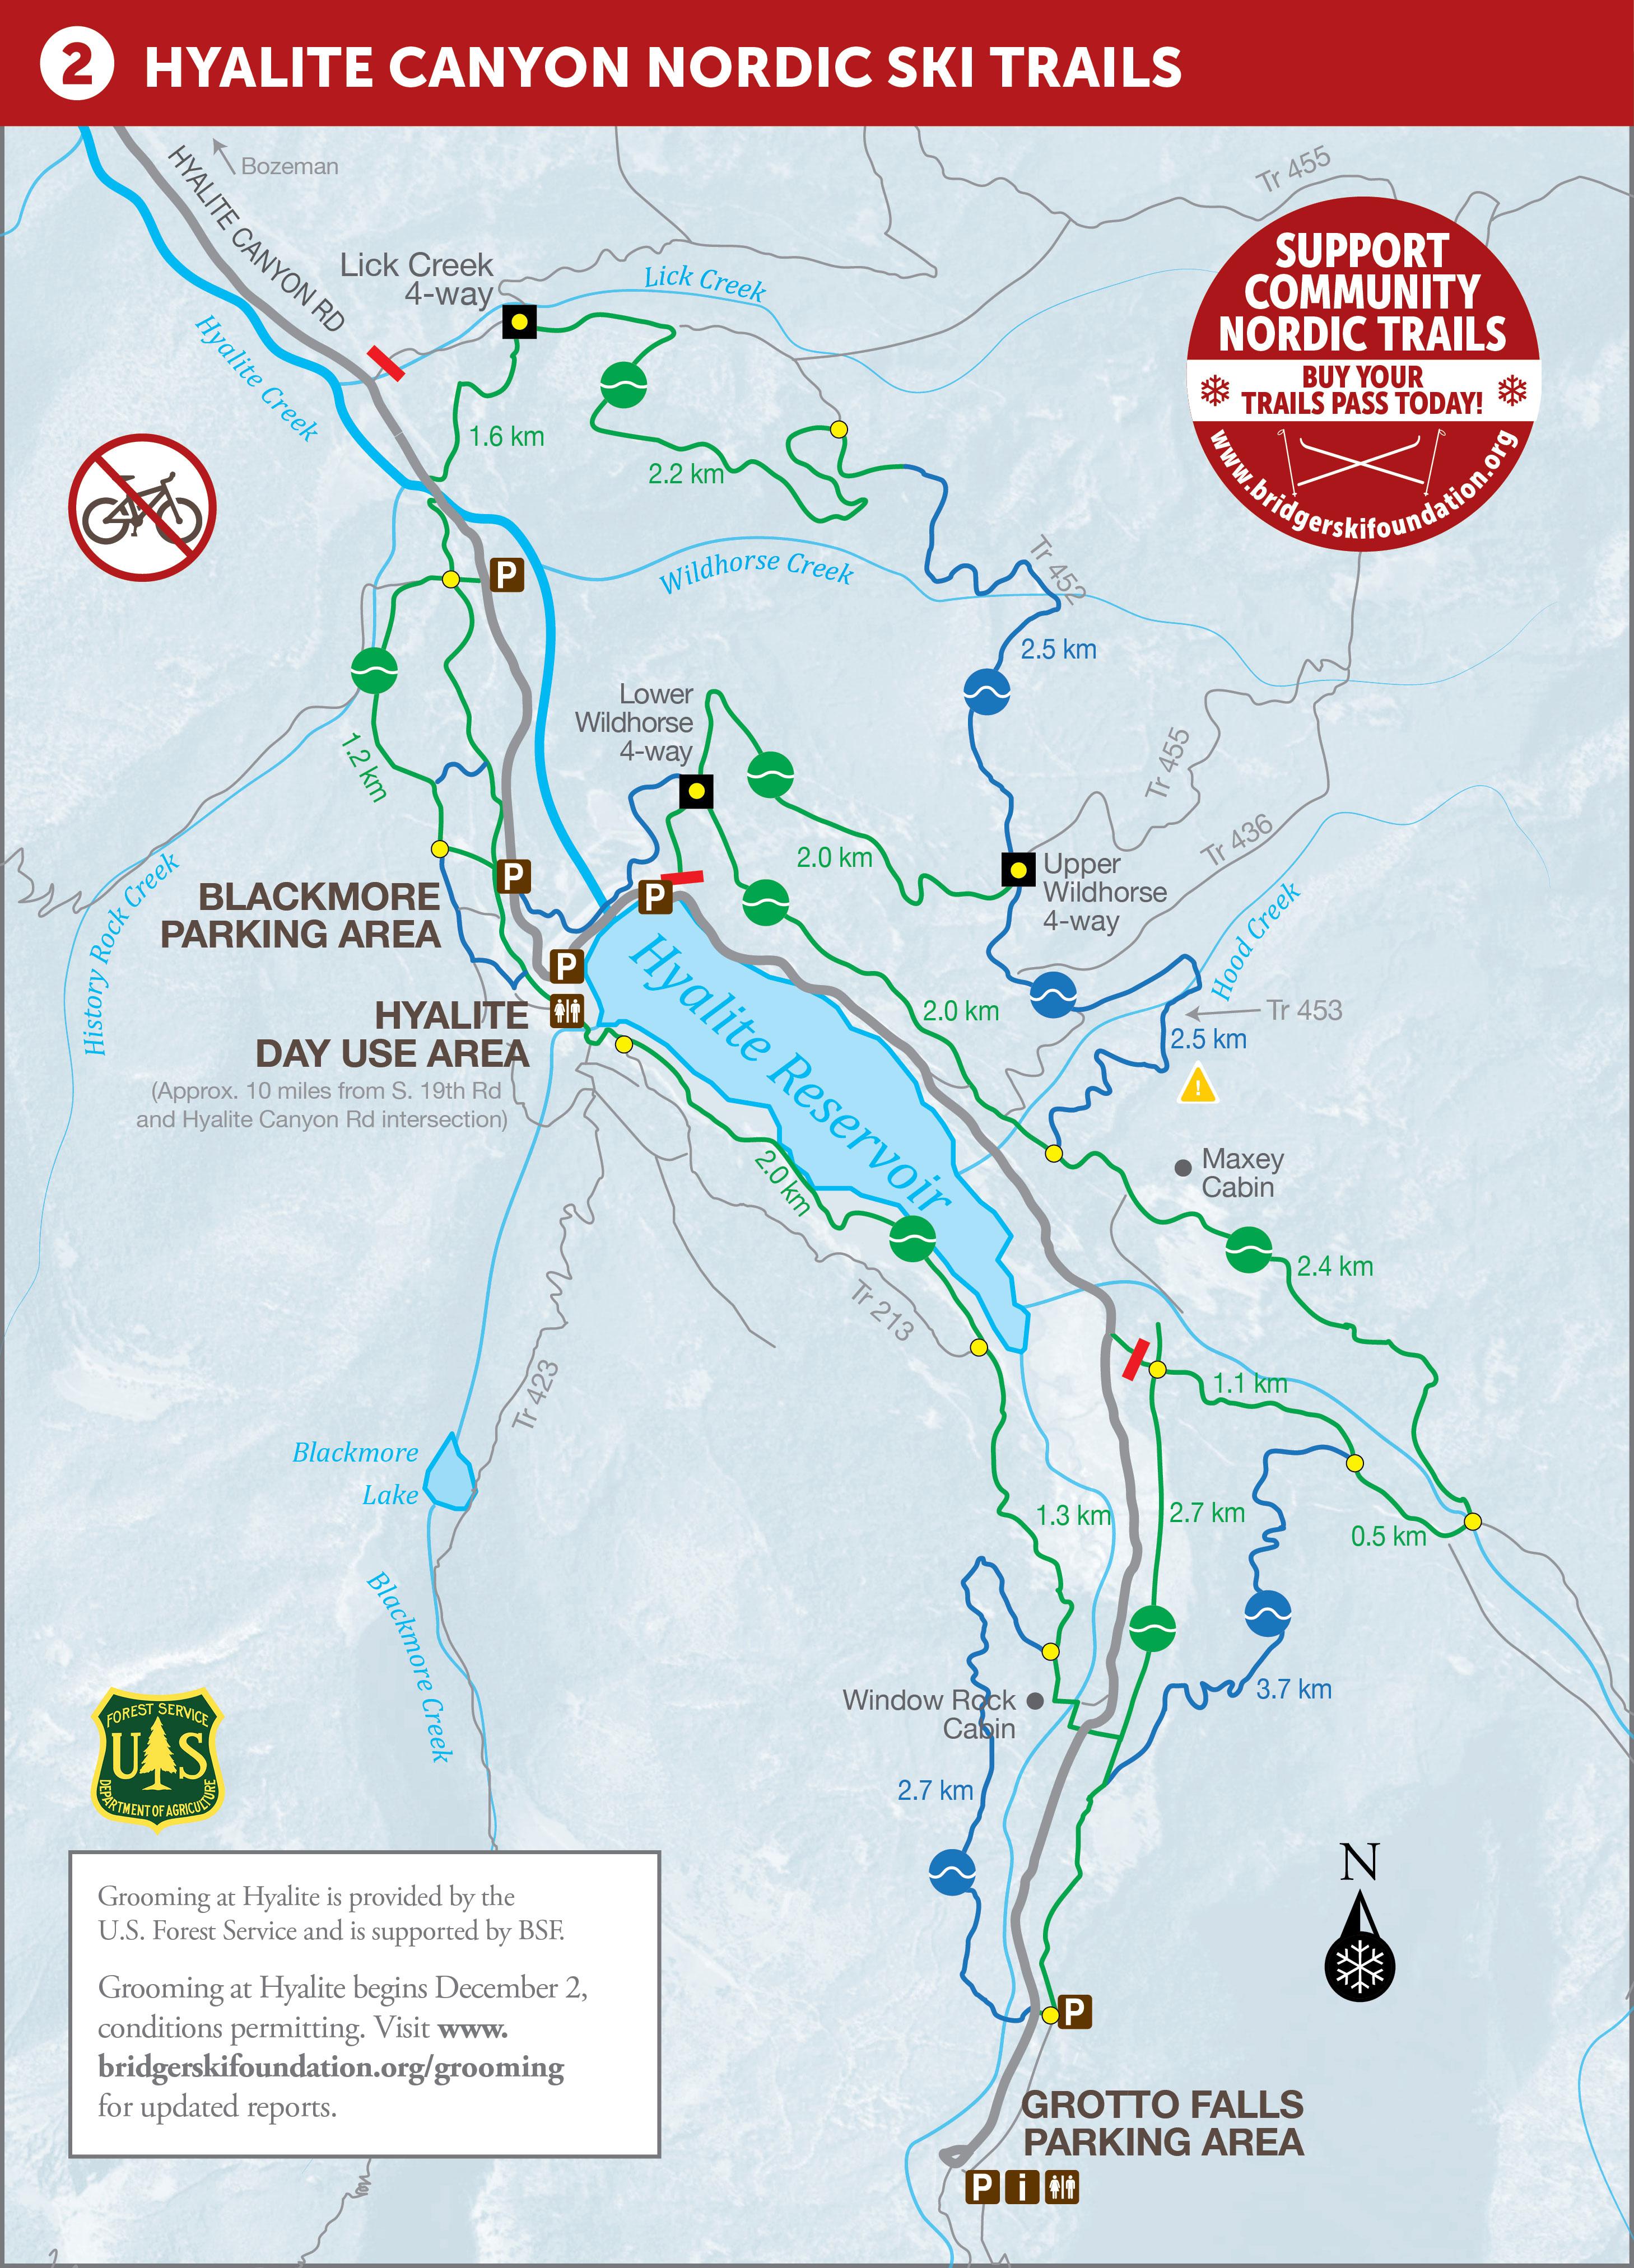 Bozeman Community Nordic Trails Maps on